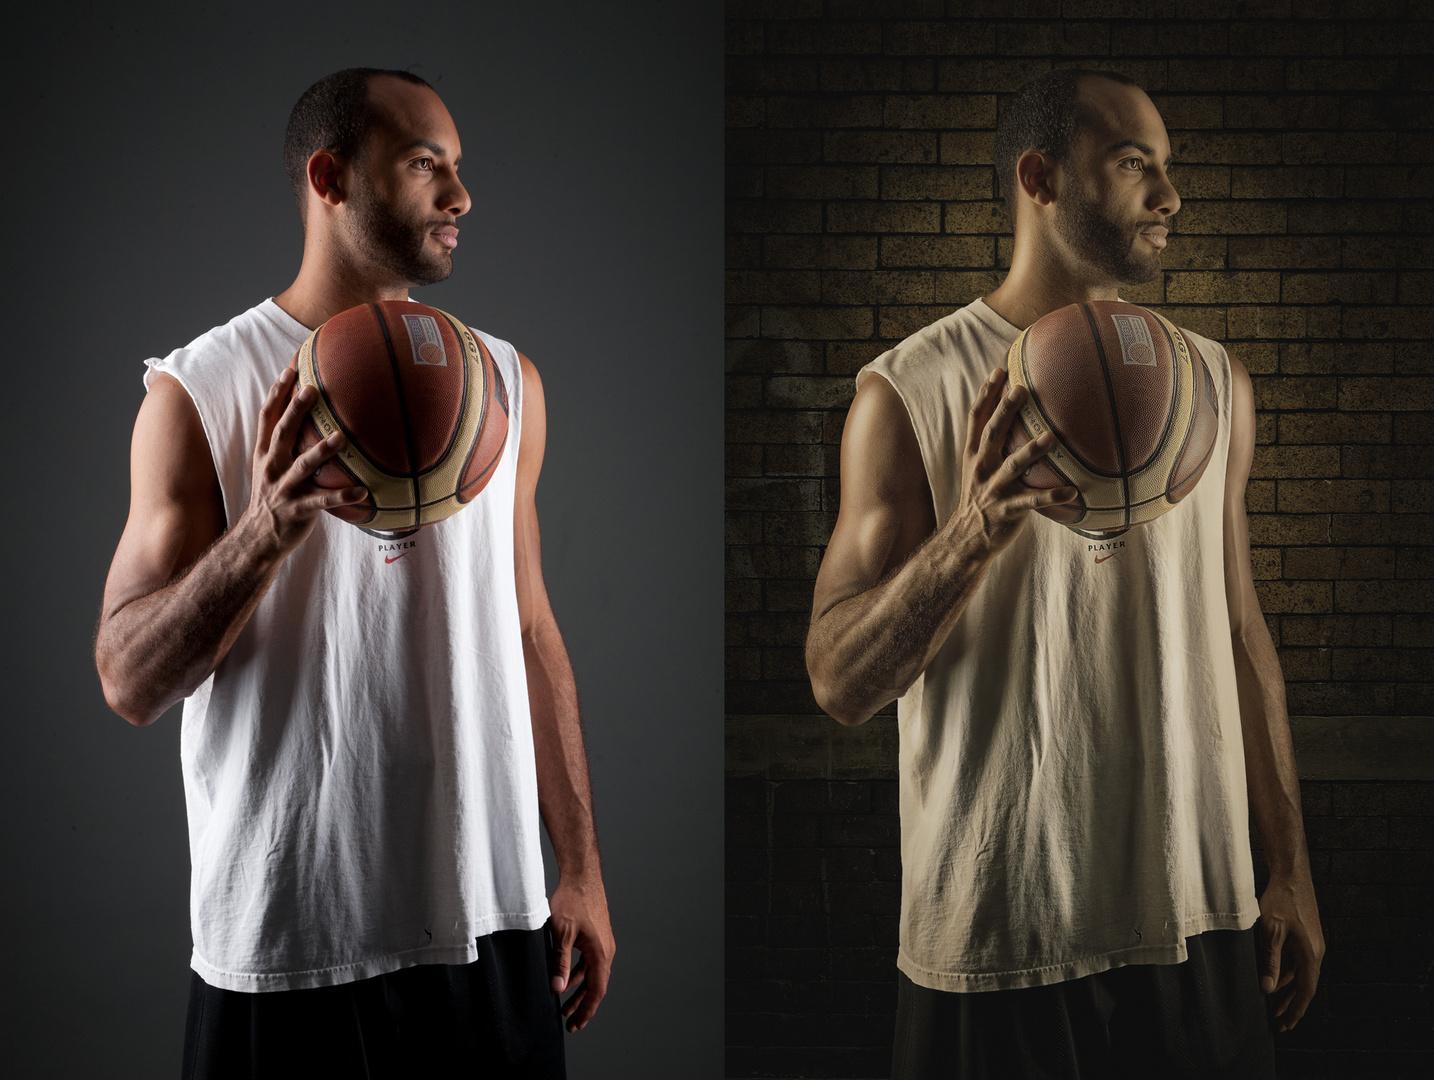 Jay Thomas - Basketball